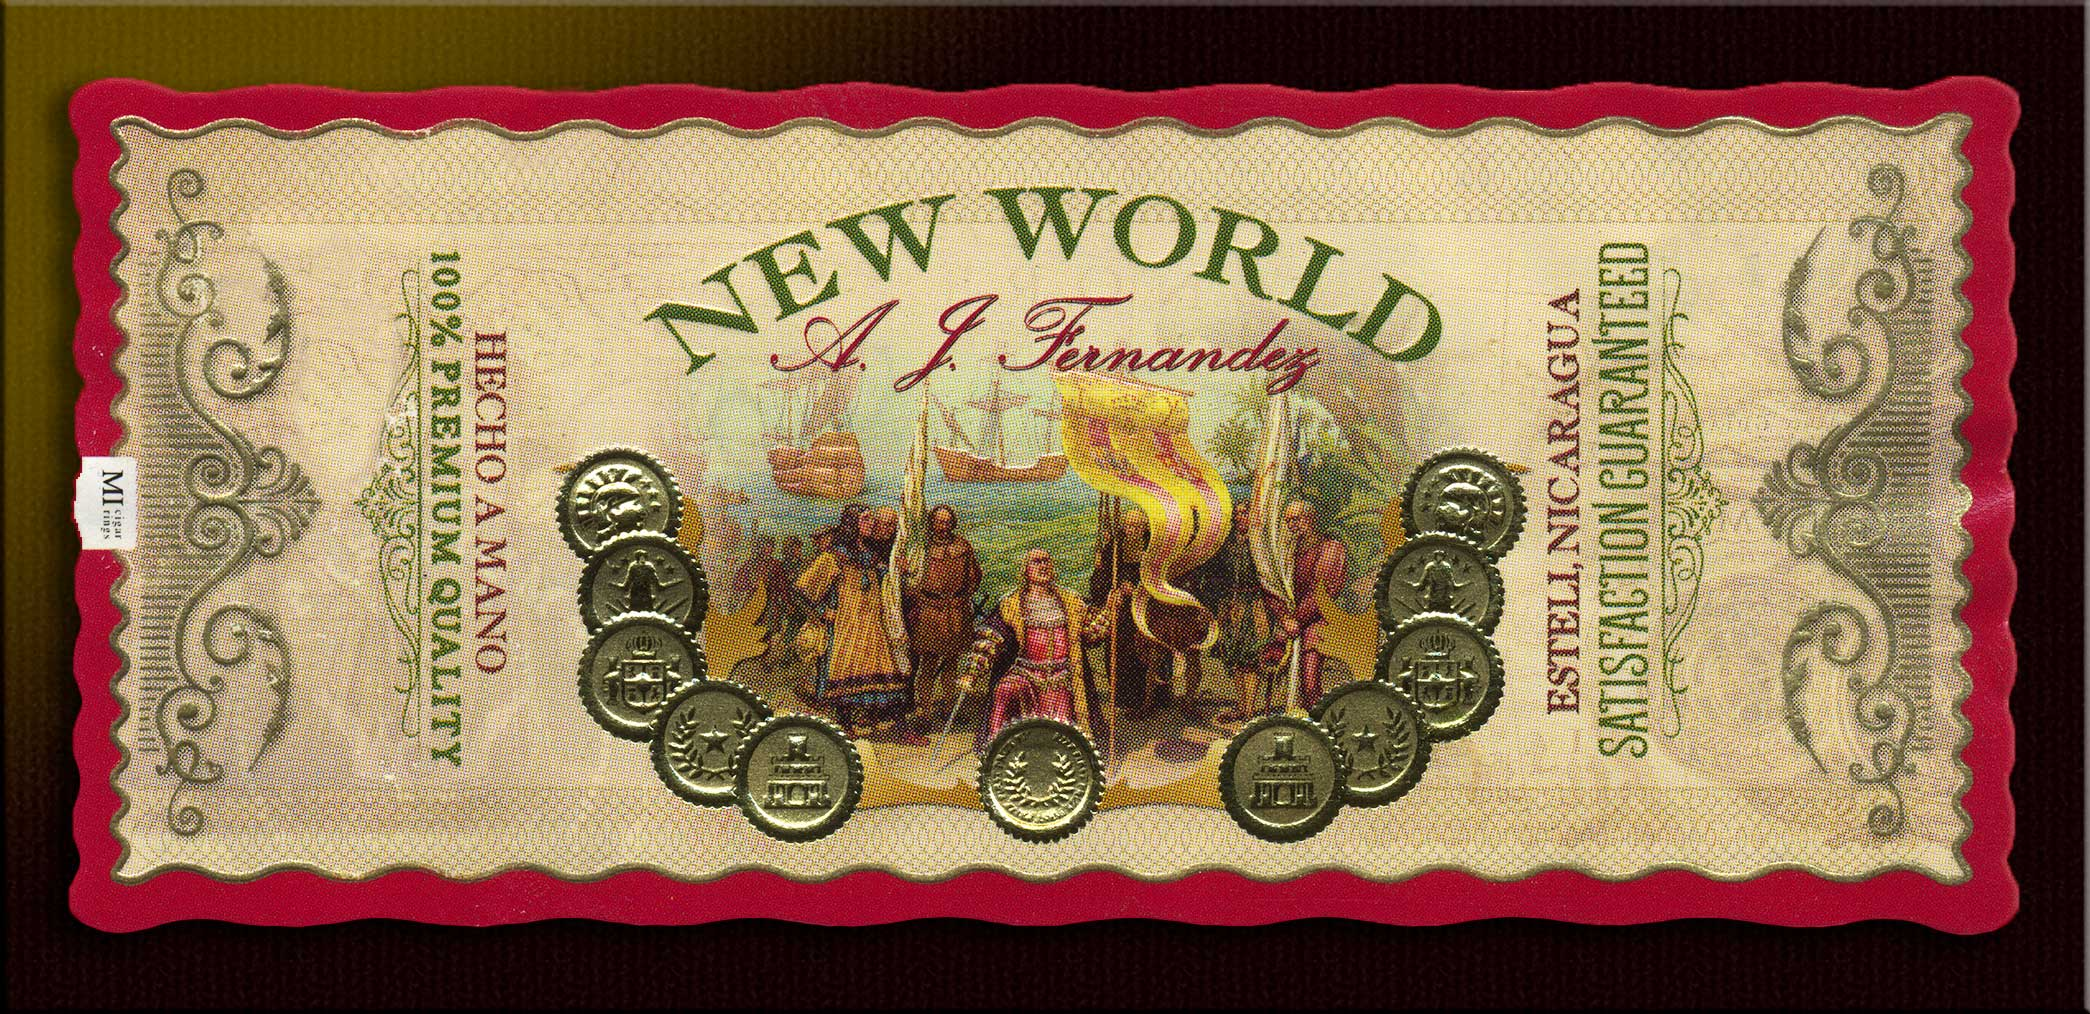 World News Gallery: Cigar Band Art Gallery